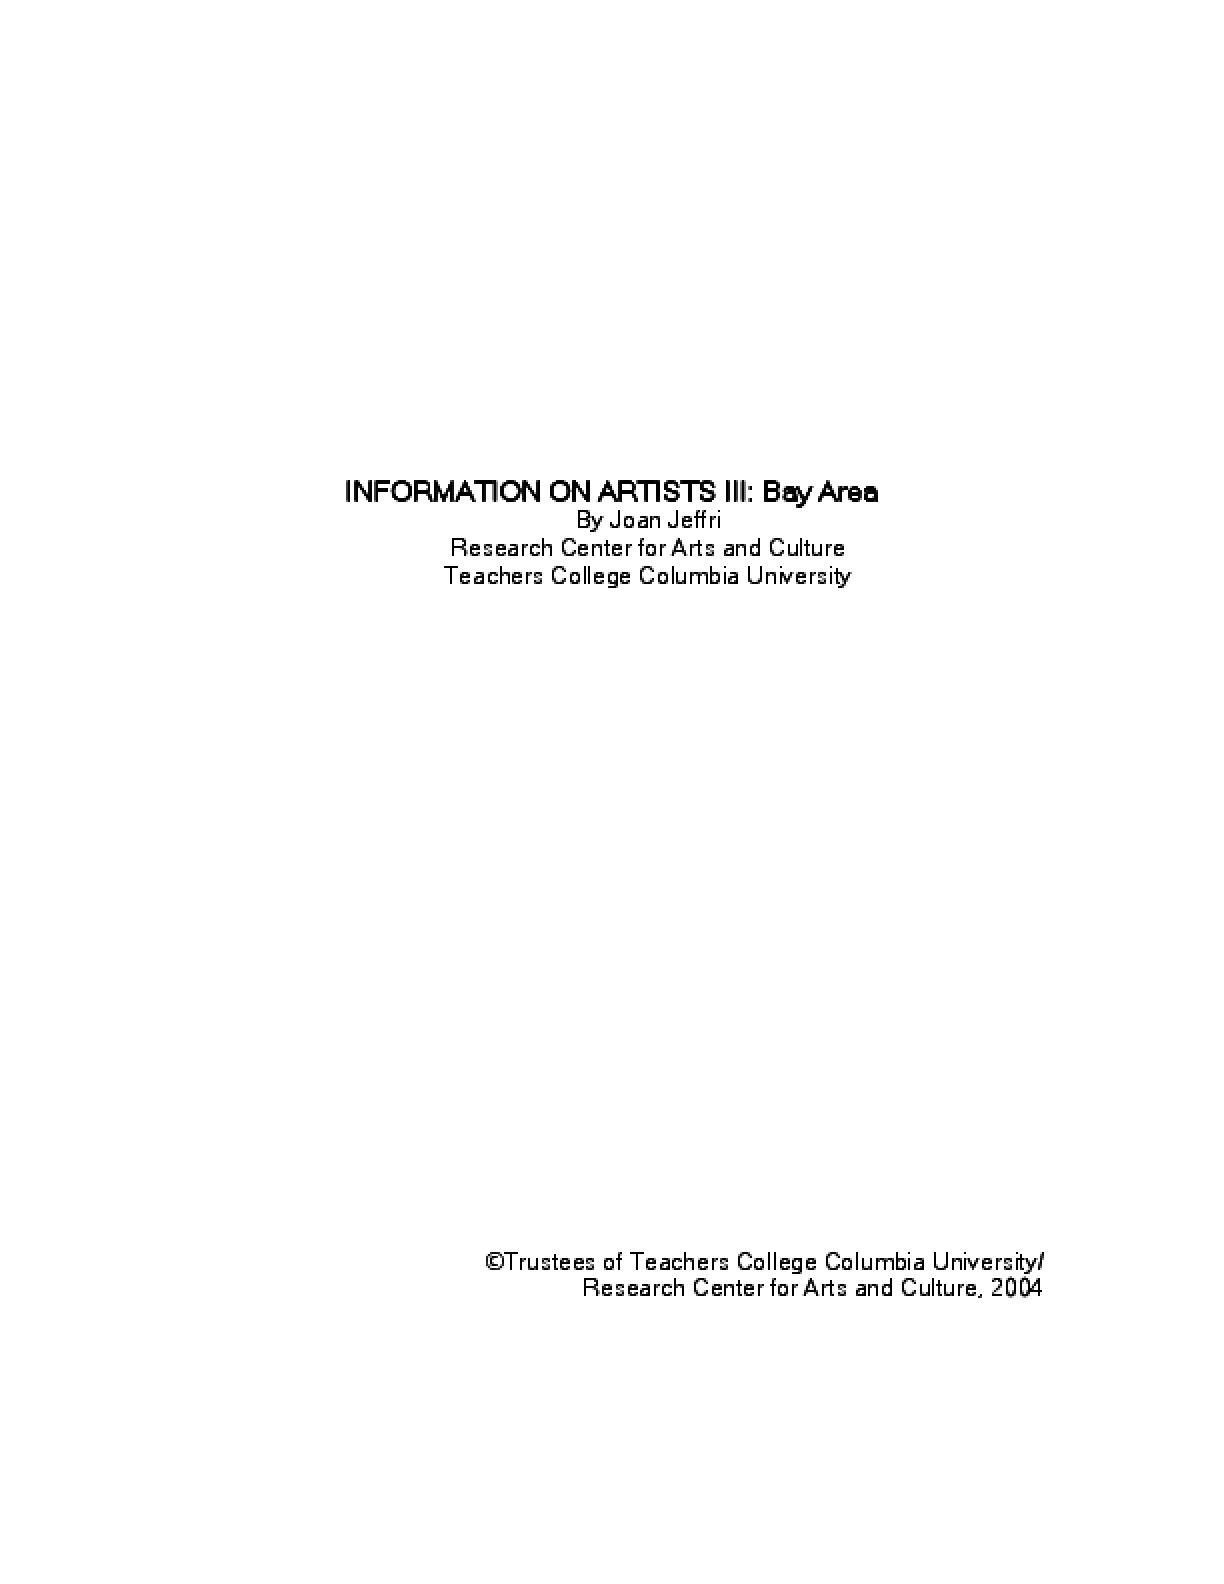 Information on Artists III: Bay Area